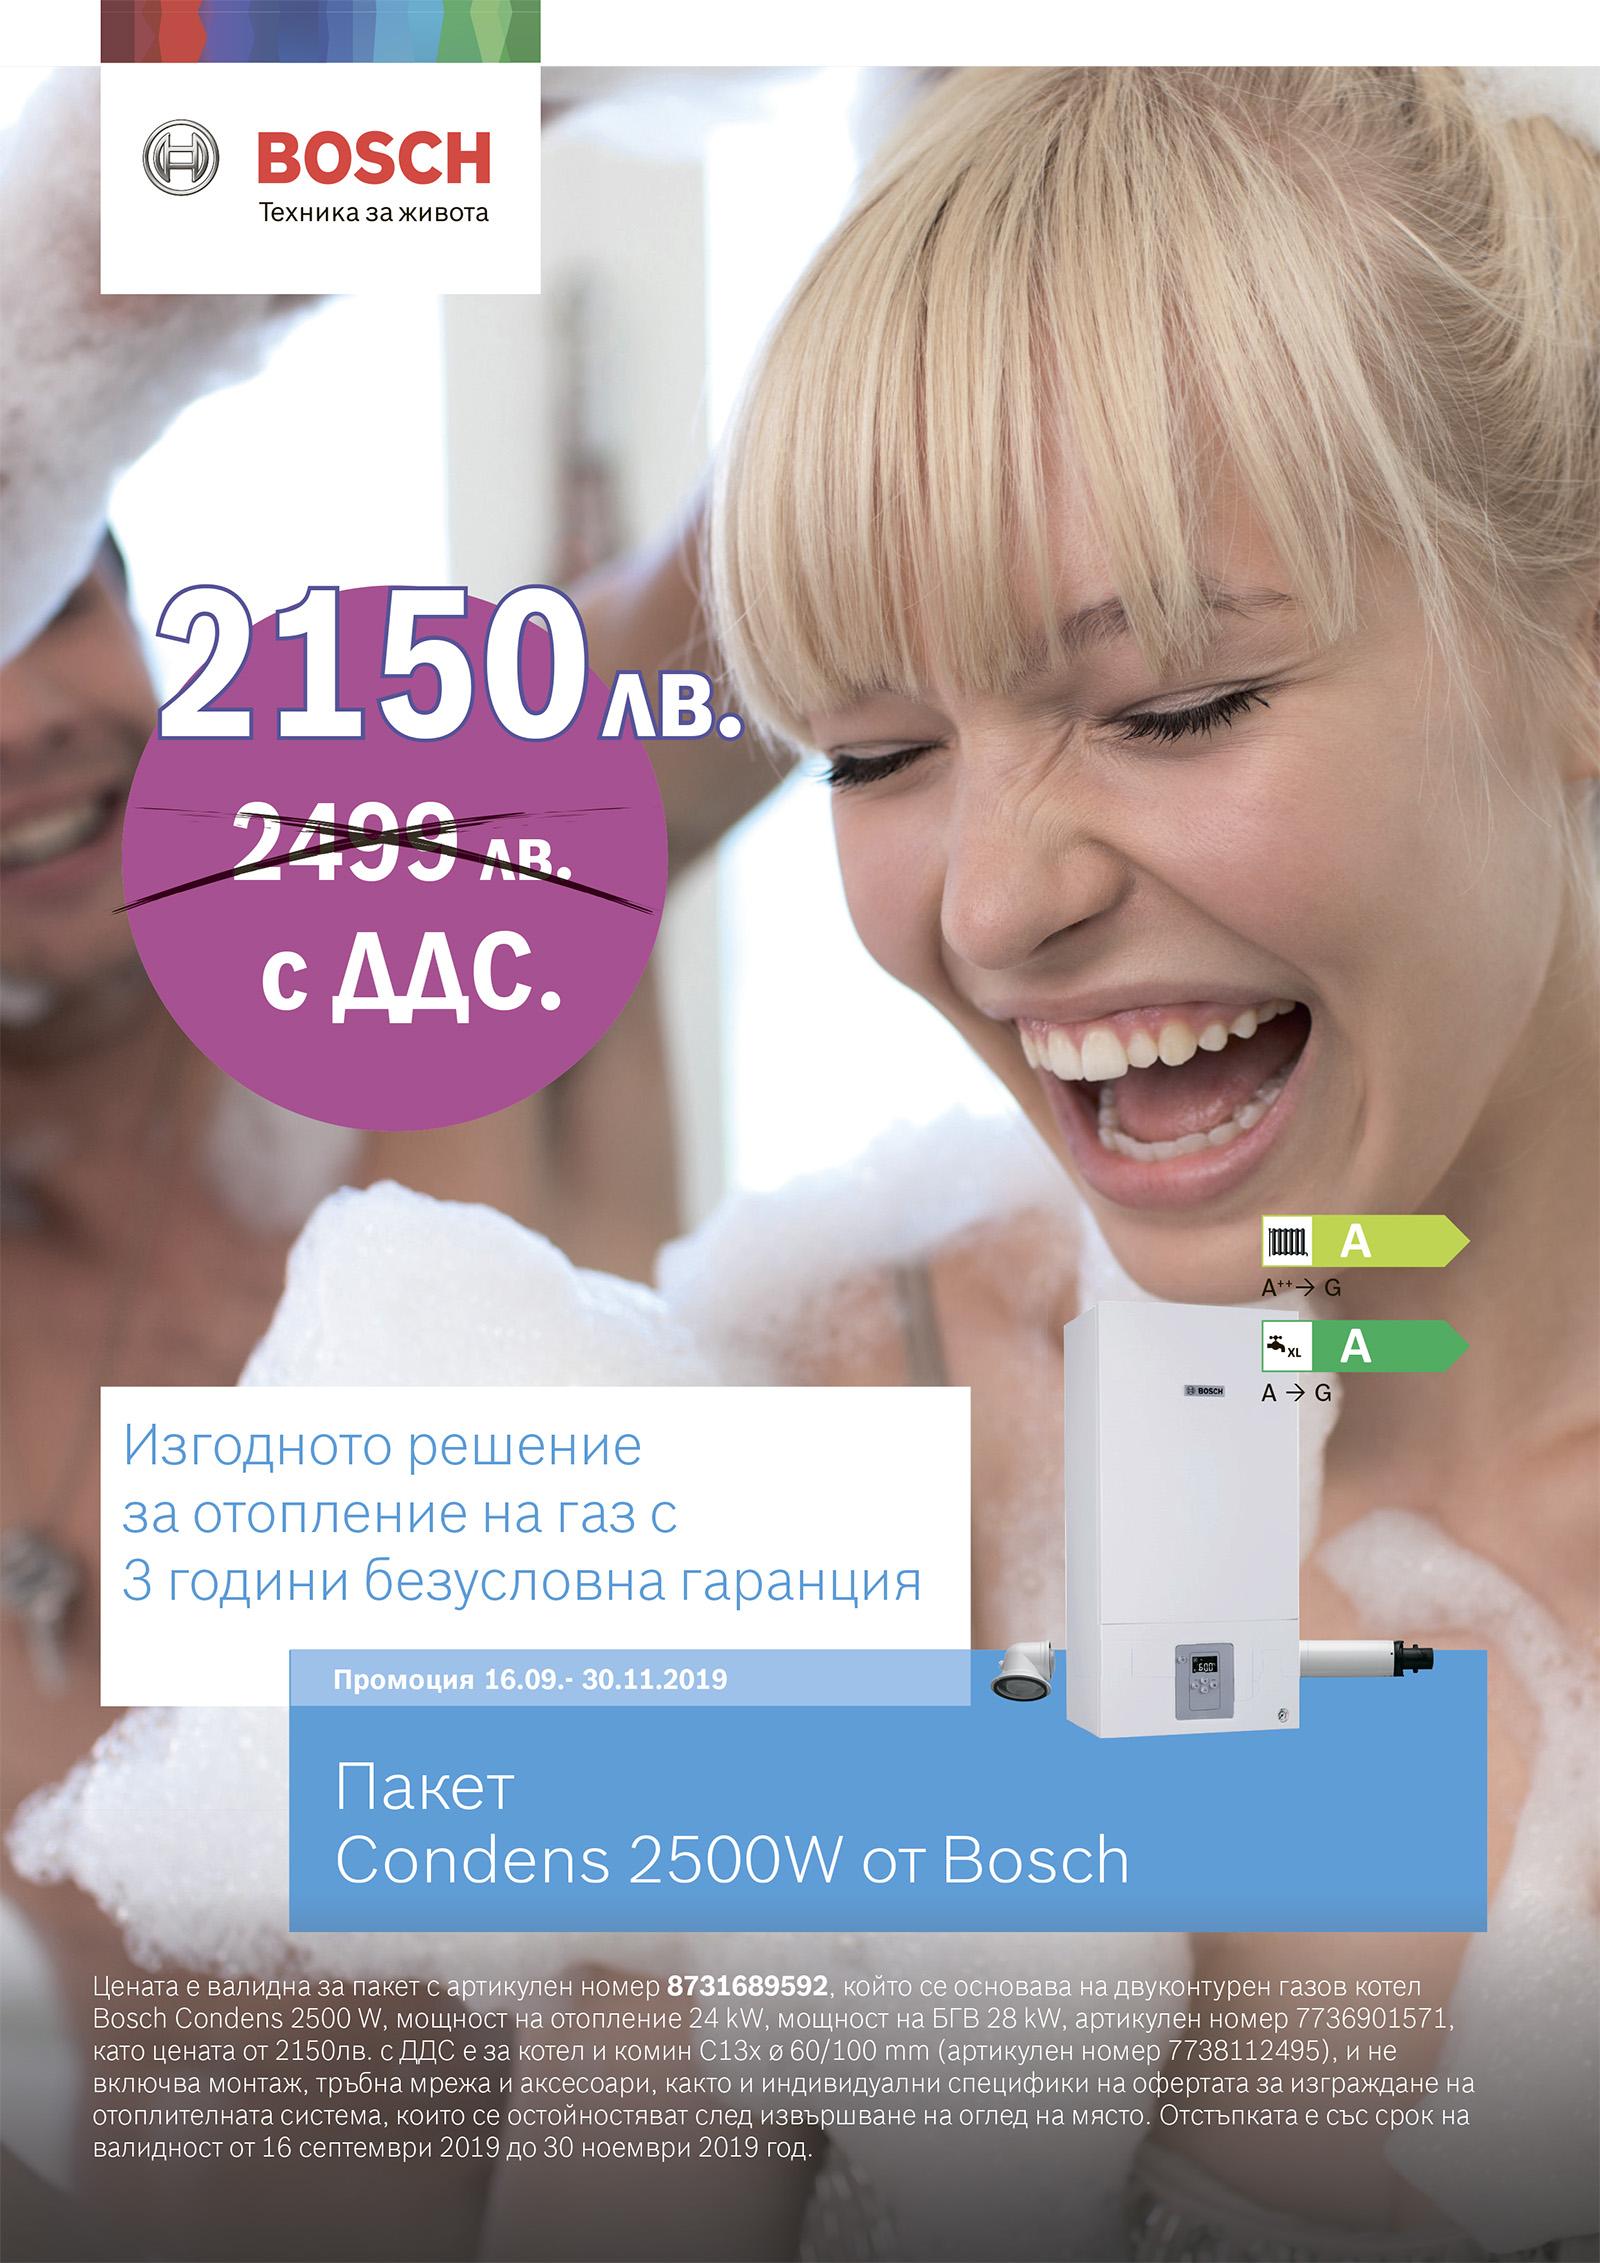 Condens 2500W Bosch